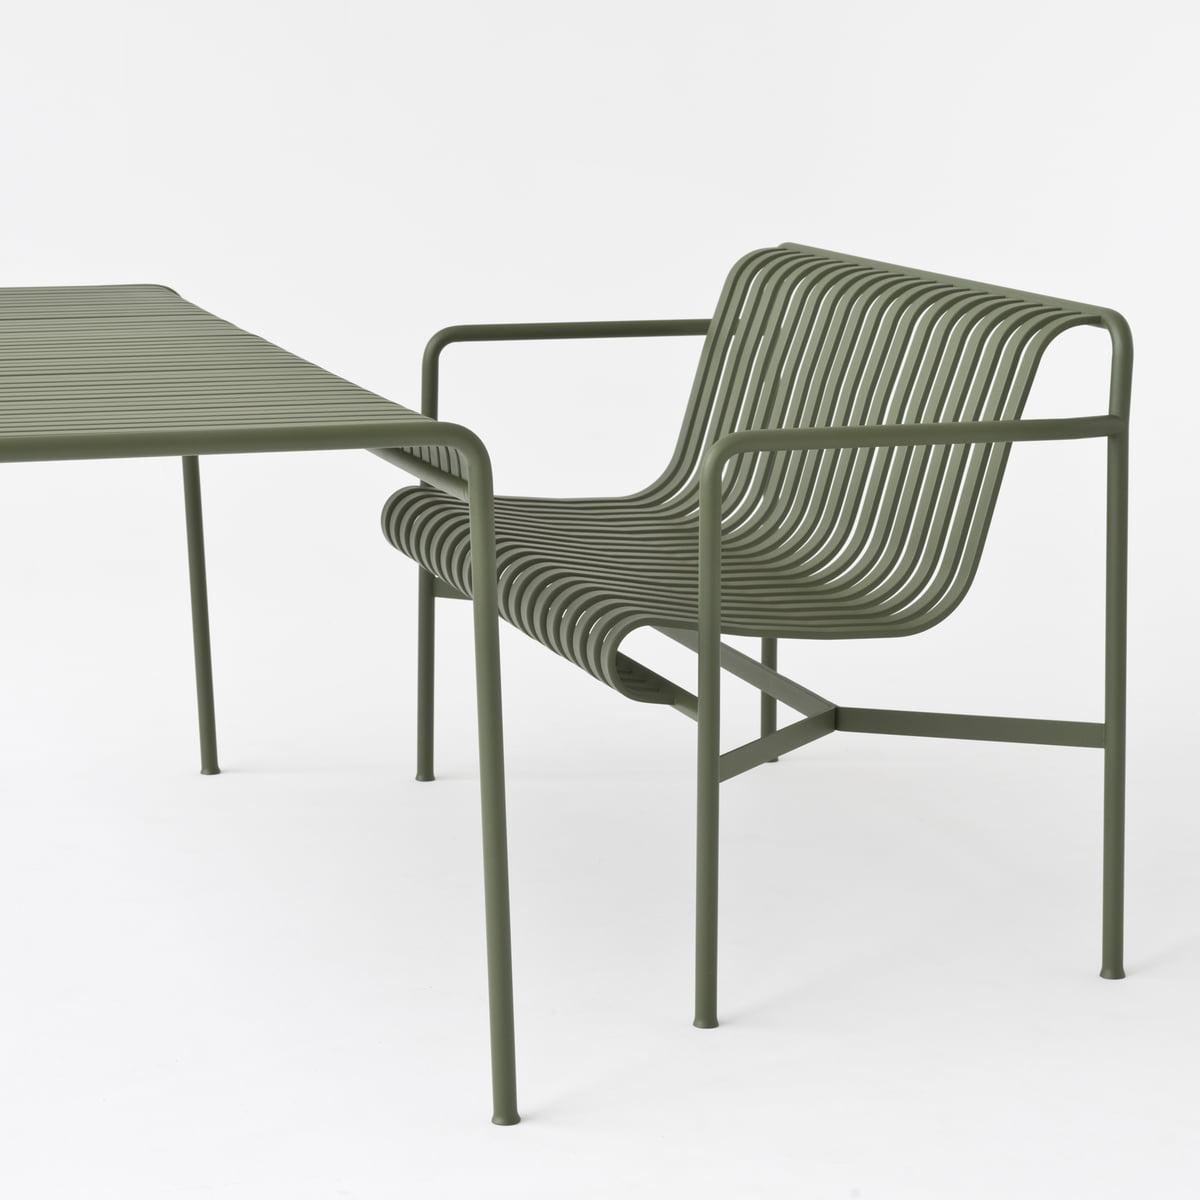 palissade bench by hay connox home design. Black Bedroom Furniture Sets. Home Design Ideas